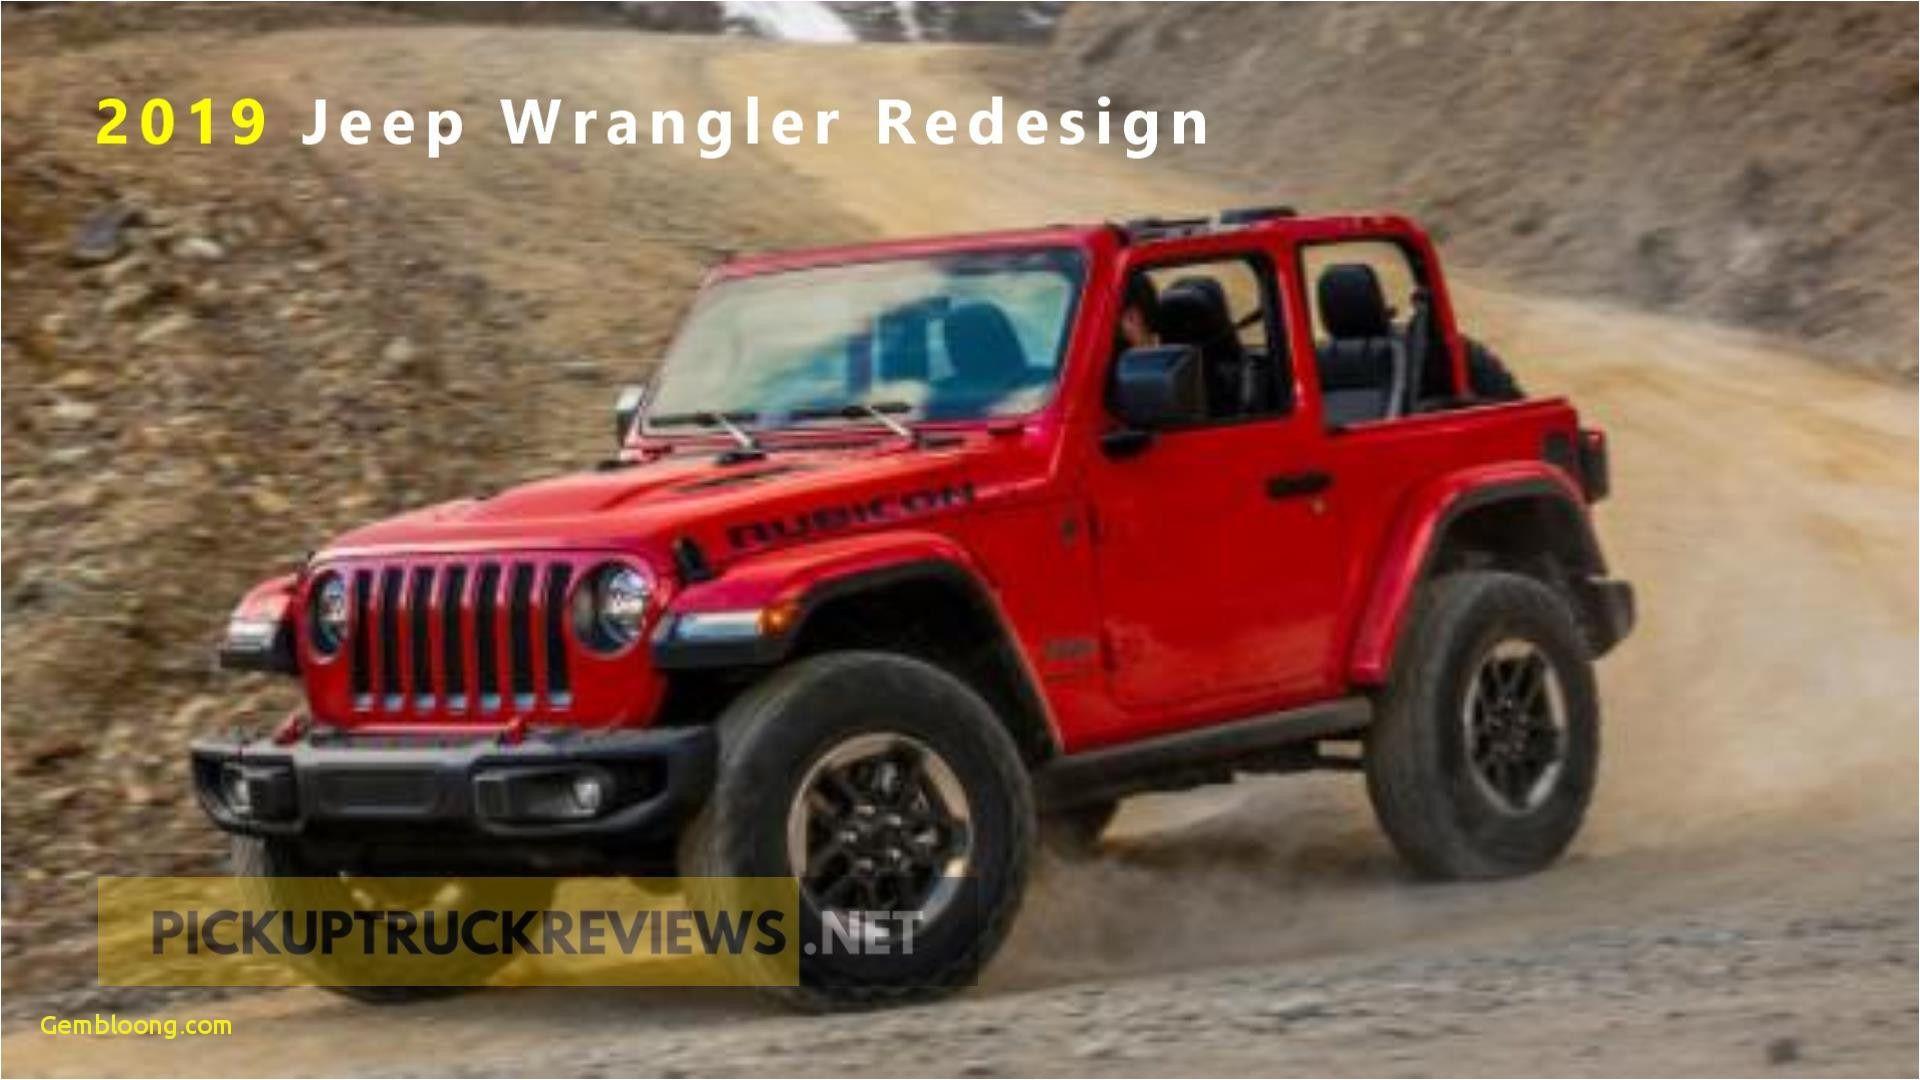 Pin Oleh Autocar99 Club Di Cars Modif Jeep Wrangler Unlimited Jeep Grand Cherokee Dan Jeep Wrangler